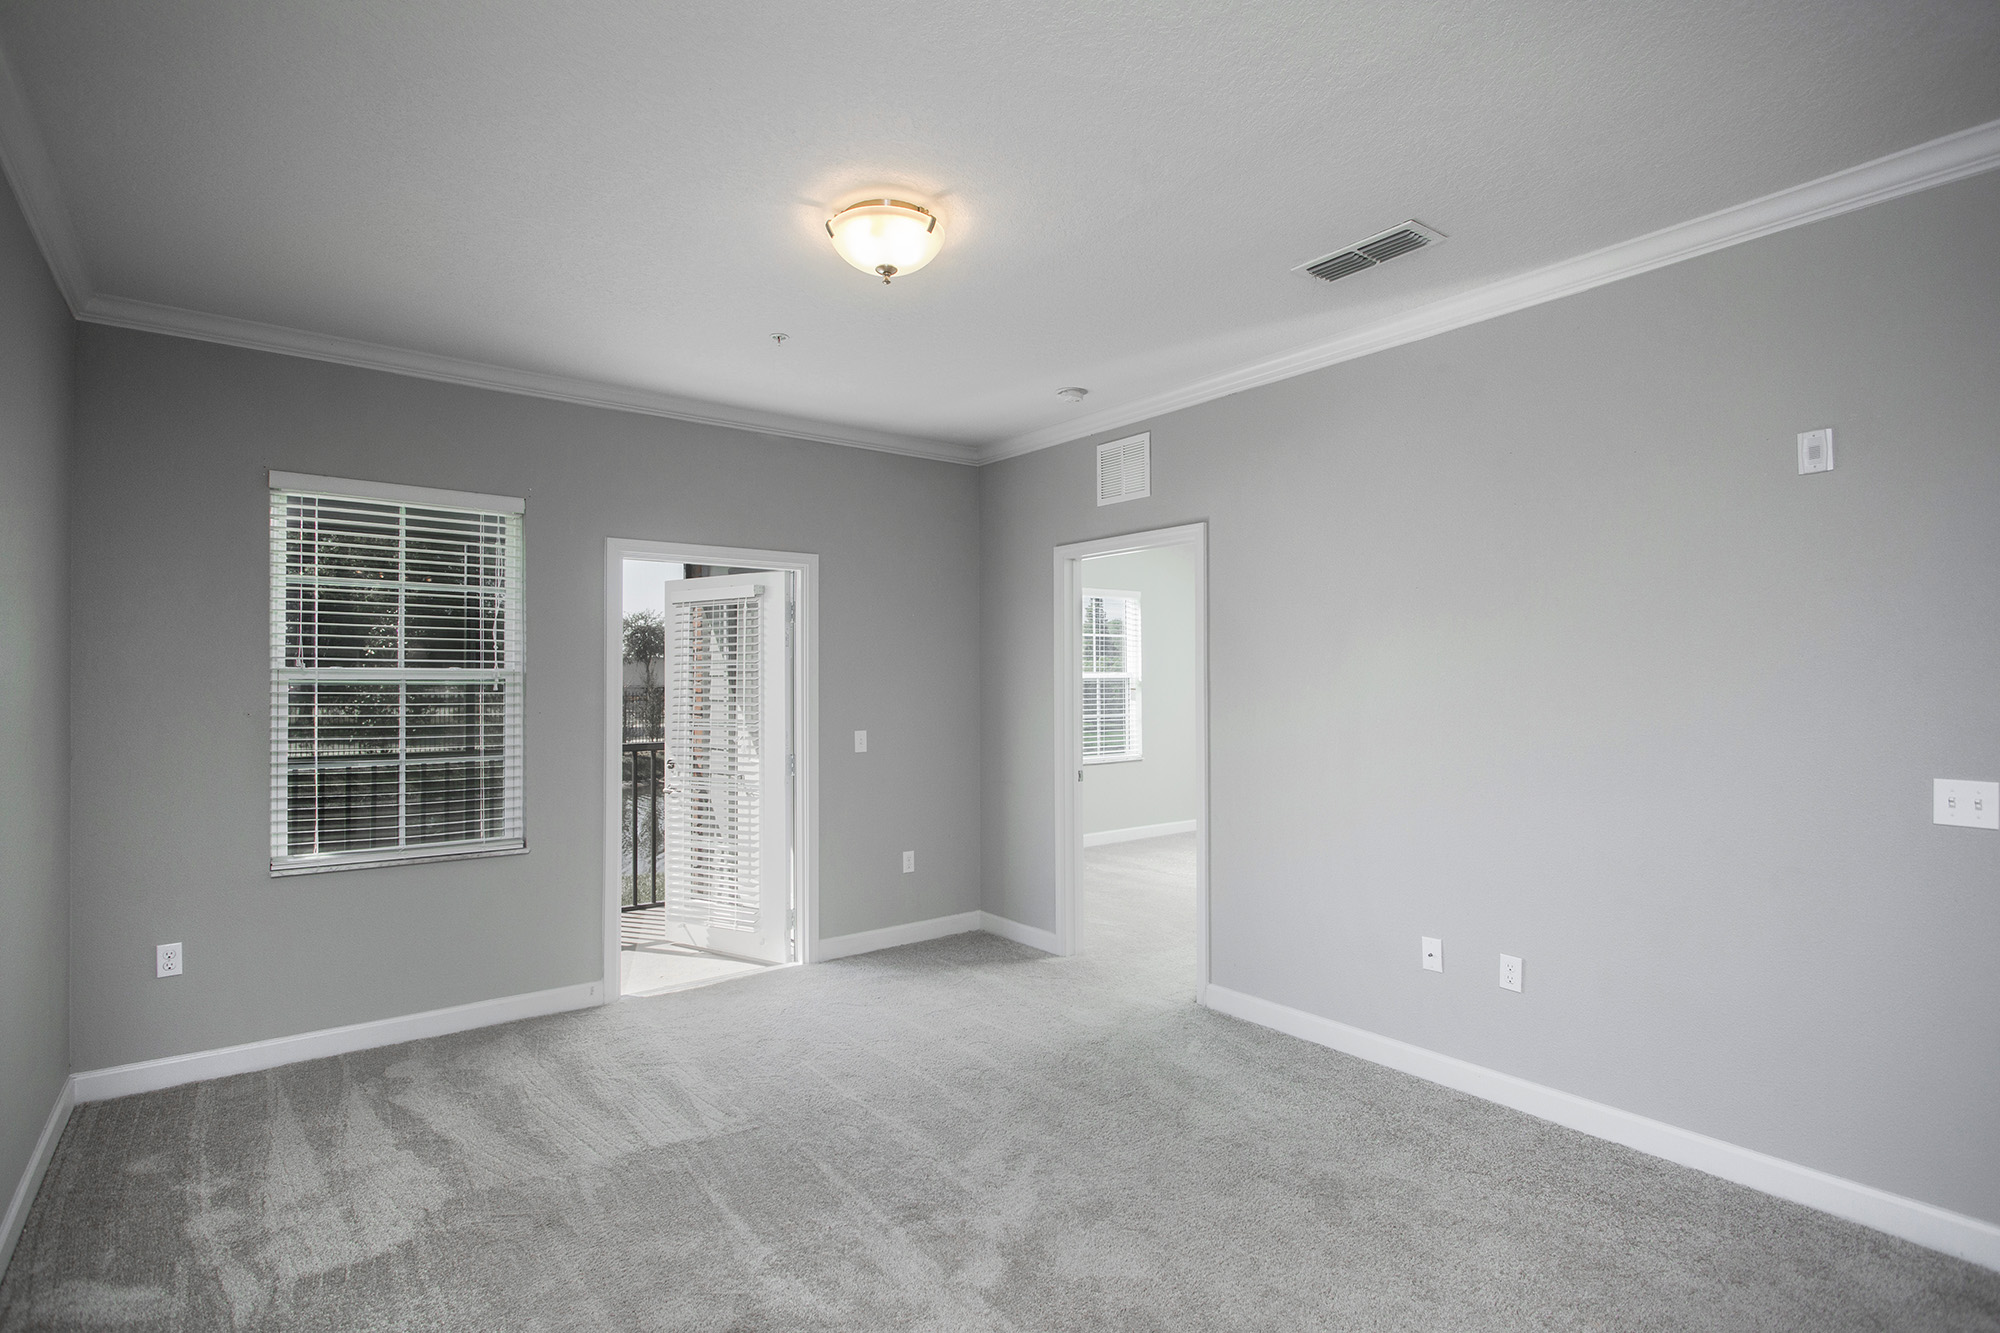 CharlestonEdge-Rental-Apartment-Brandon-Tampa-Florida-Pool-Bedrooms-Interior-4.jpg